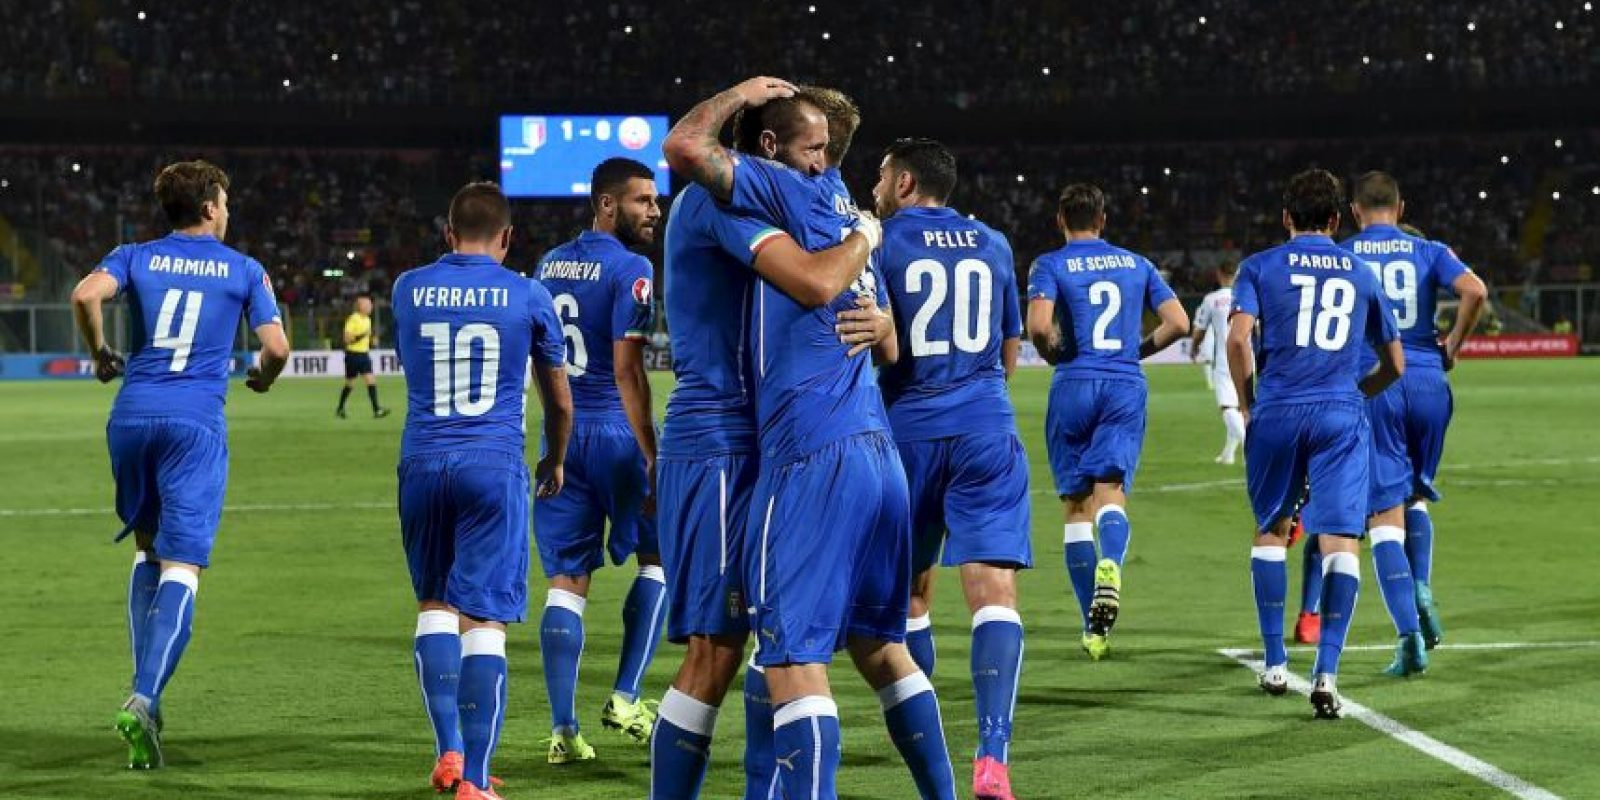 17. Italia Foto:Getty Images